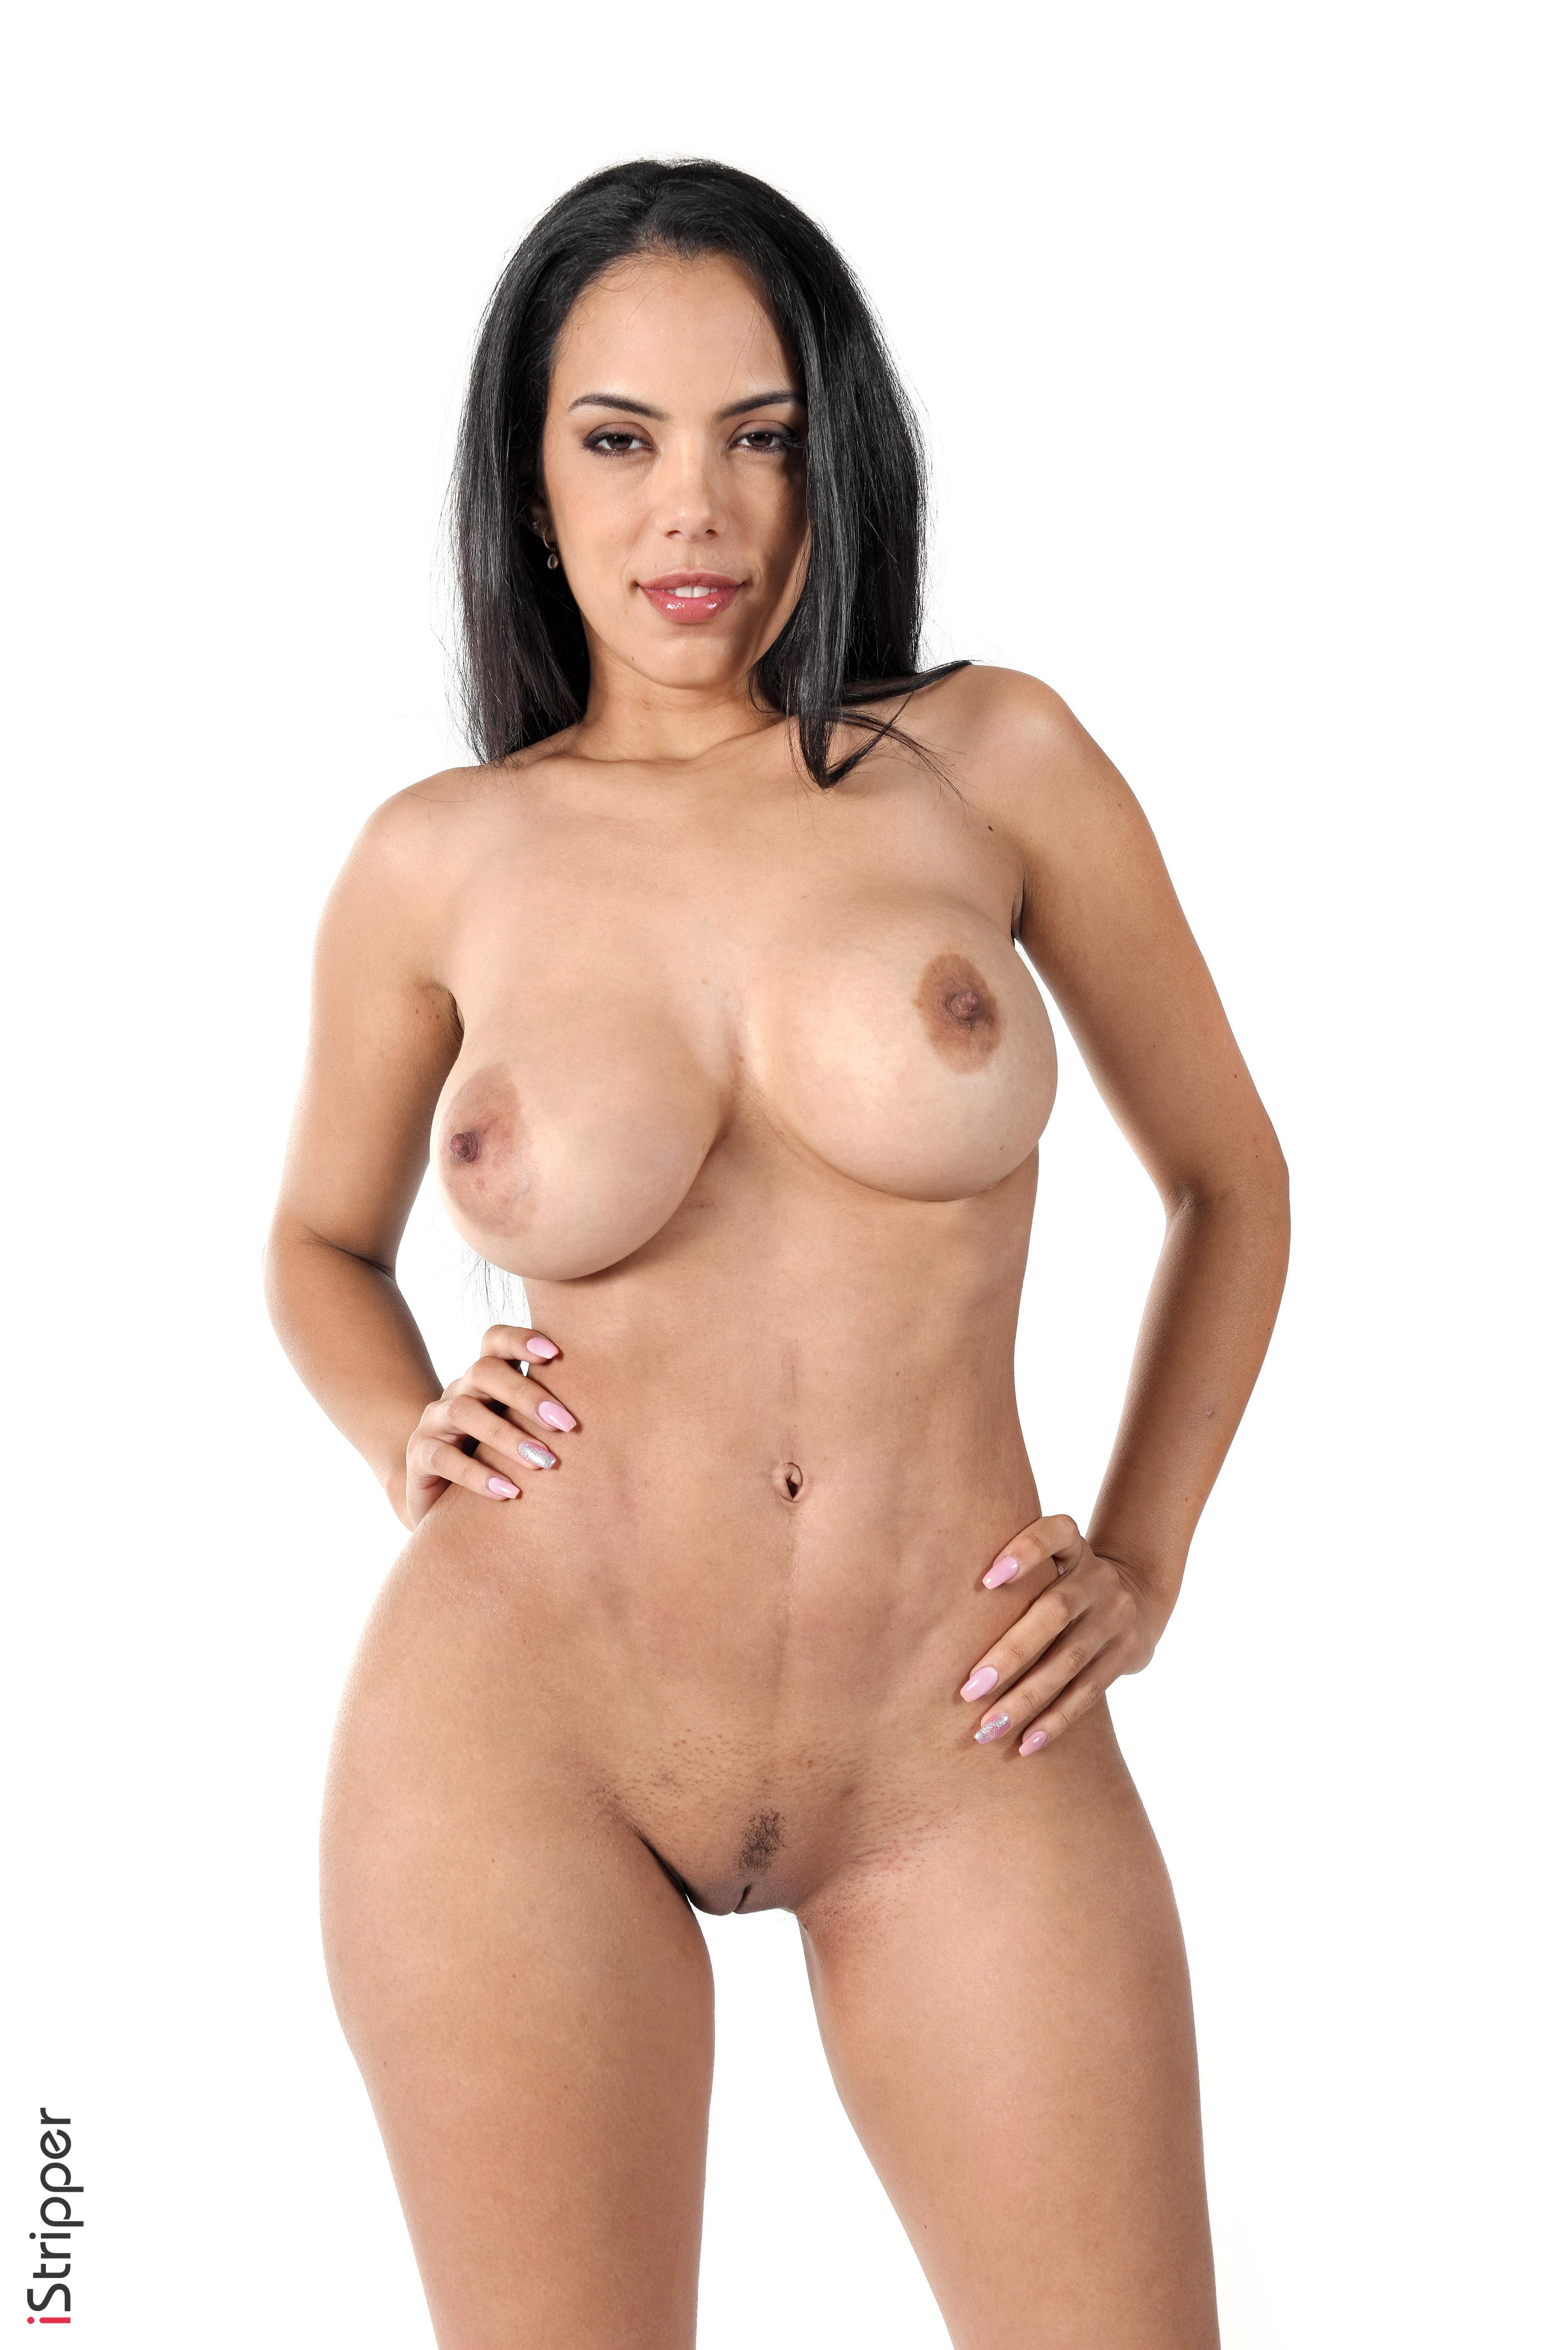 tumblr hot girls stripping